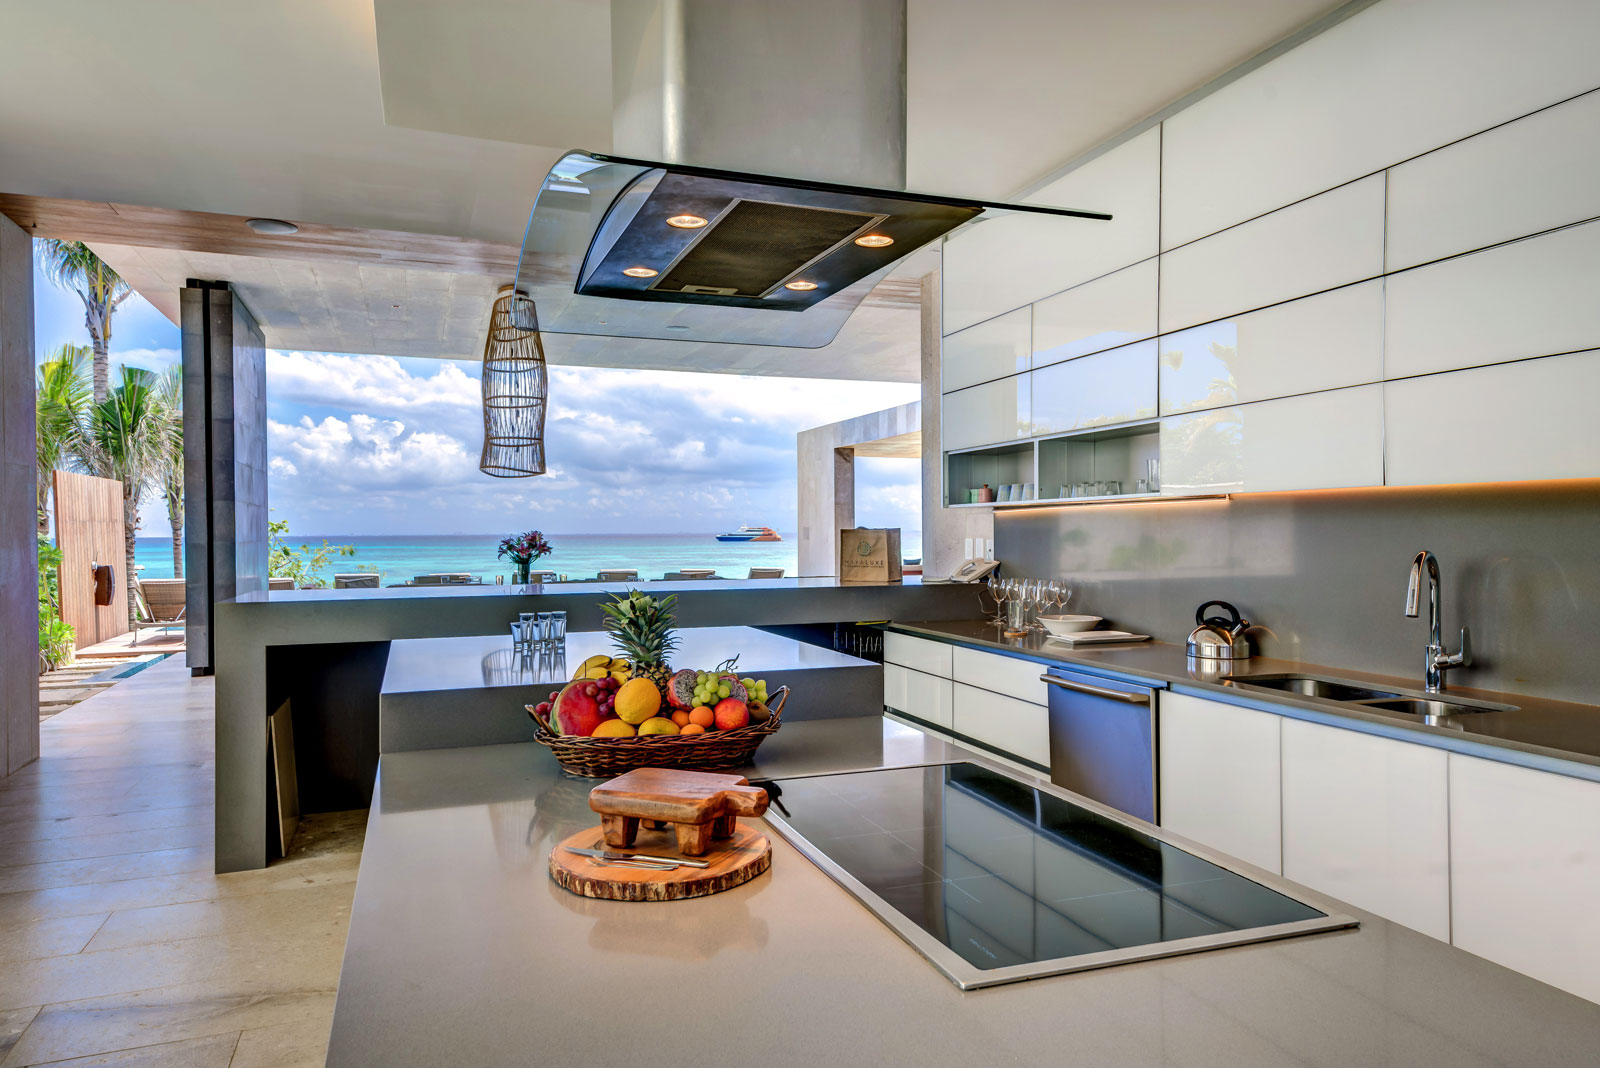 Maya_Luxe_Riviera_Maya_Luxury_Villas_Experiences_Playa_del_Carmen_Playacar_7_Bedrooms_Villa_Kin_Ich_19.jpg